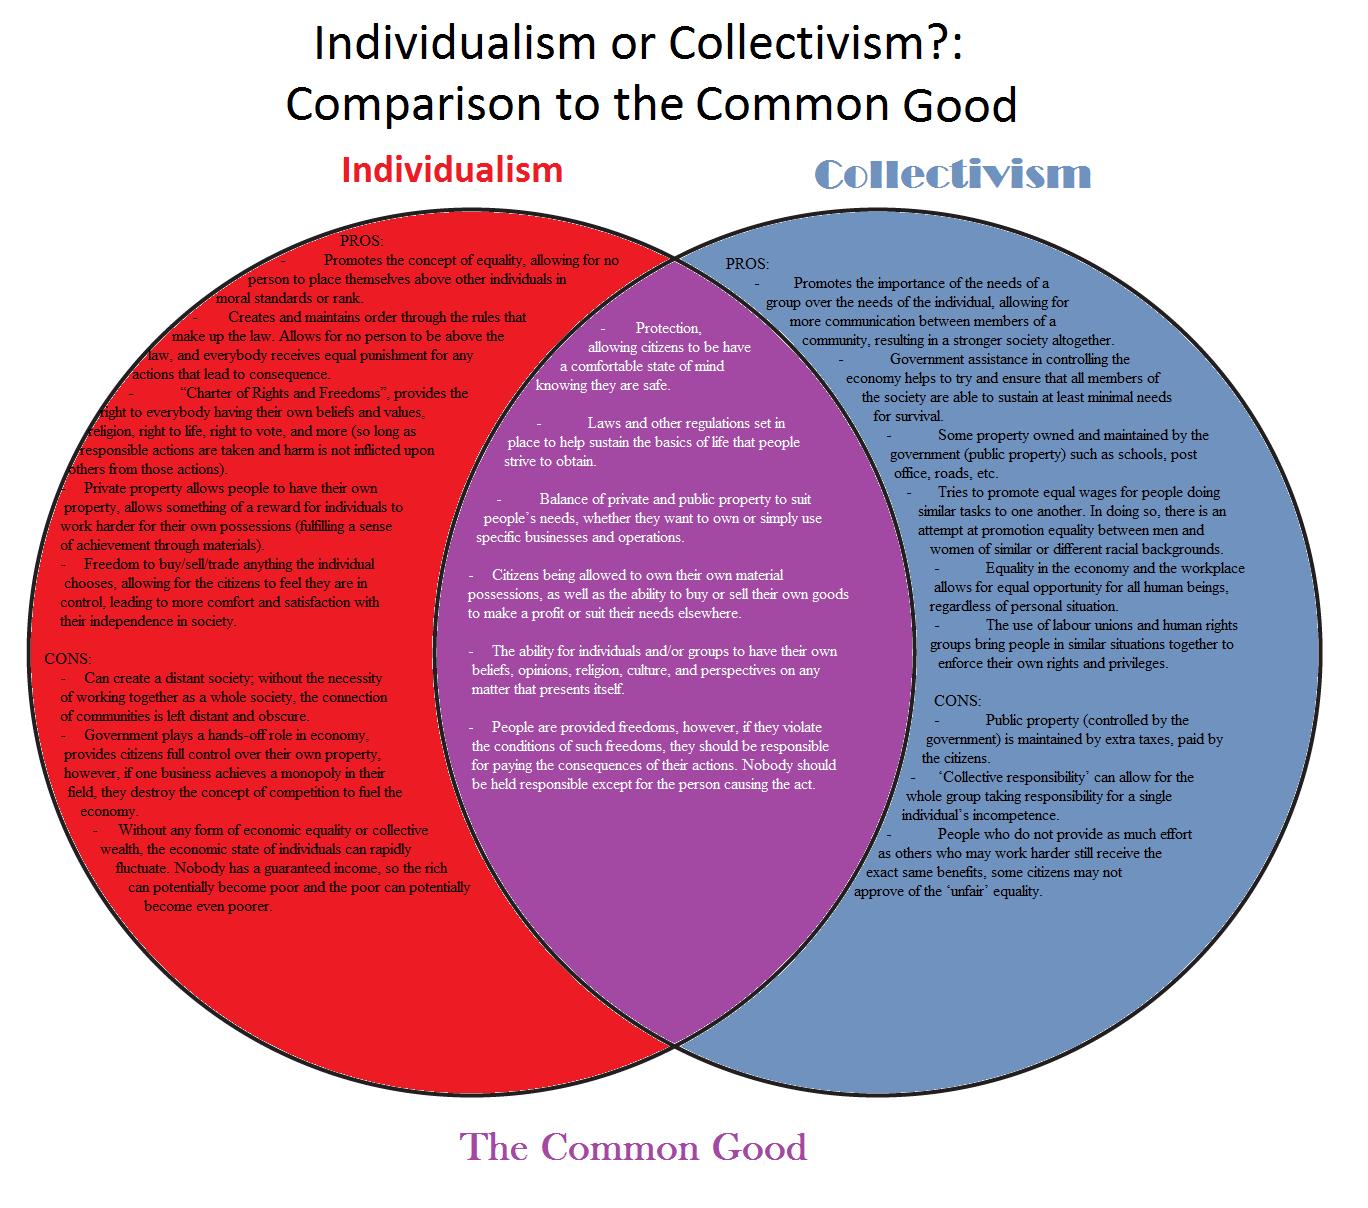 communism vs capitalism venn diagram | Diarra